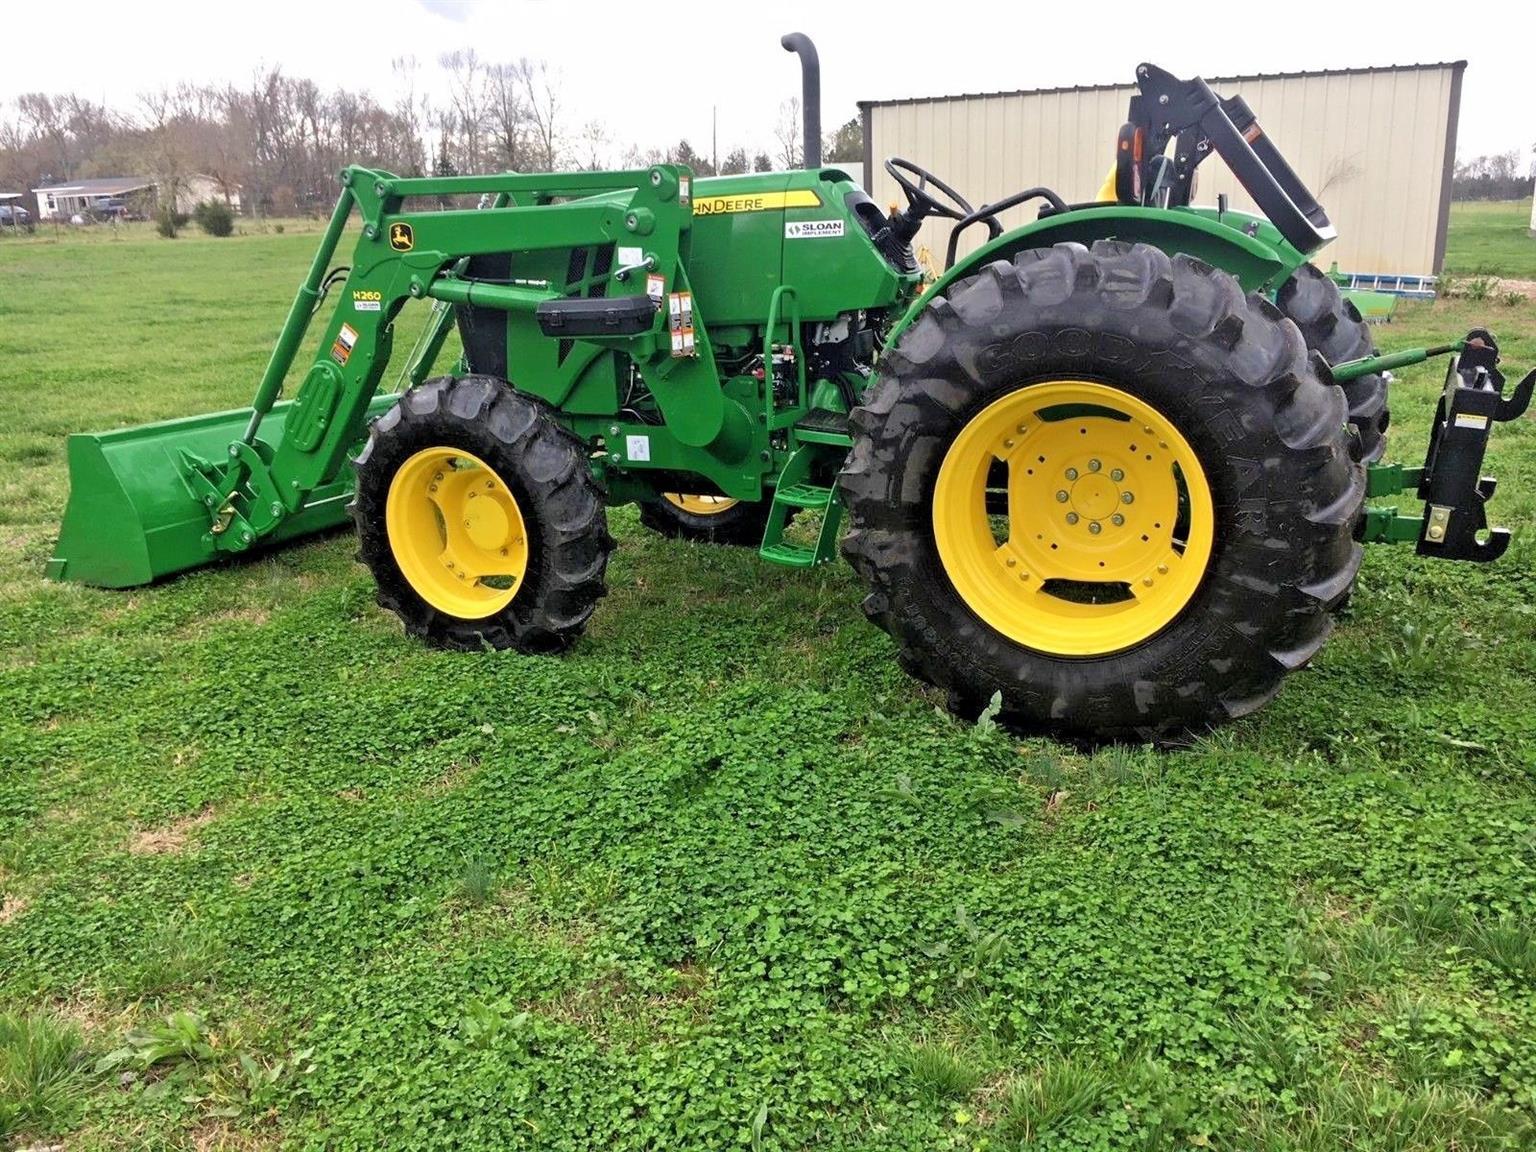 John Deere Tractor Diesel 2014 4-wheel 5100e w/loader EXCELLENT CONDITION!!!!